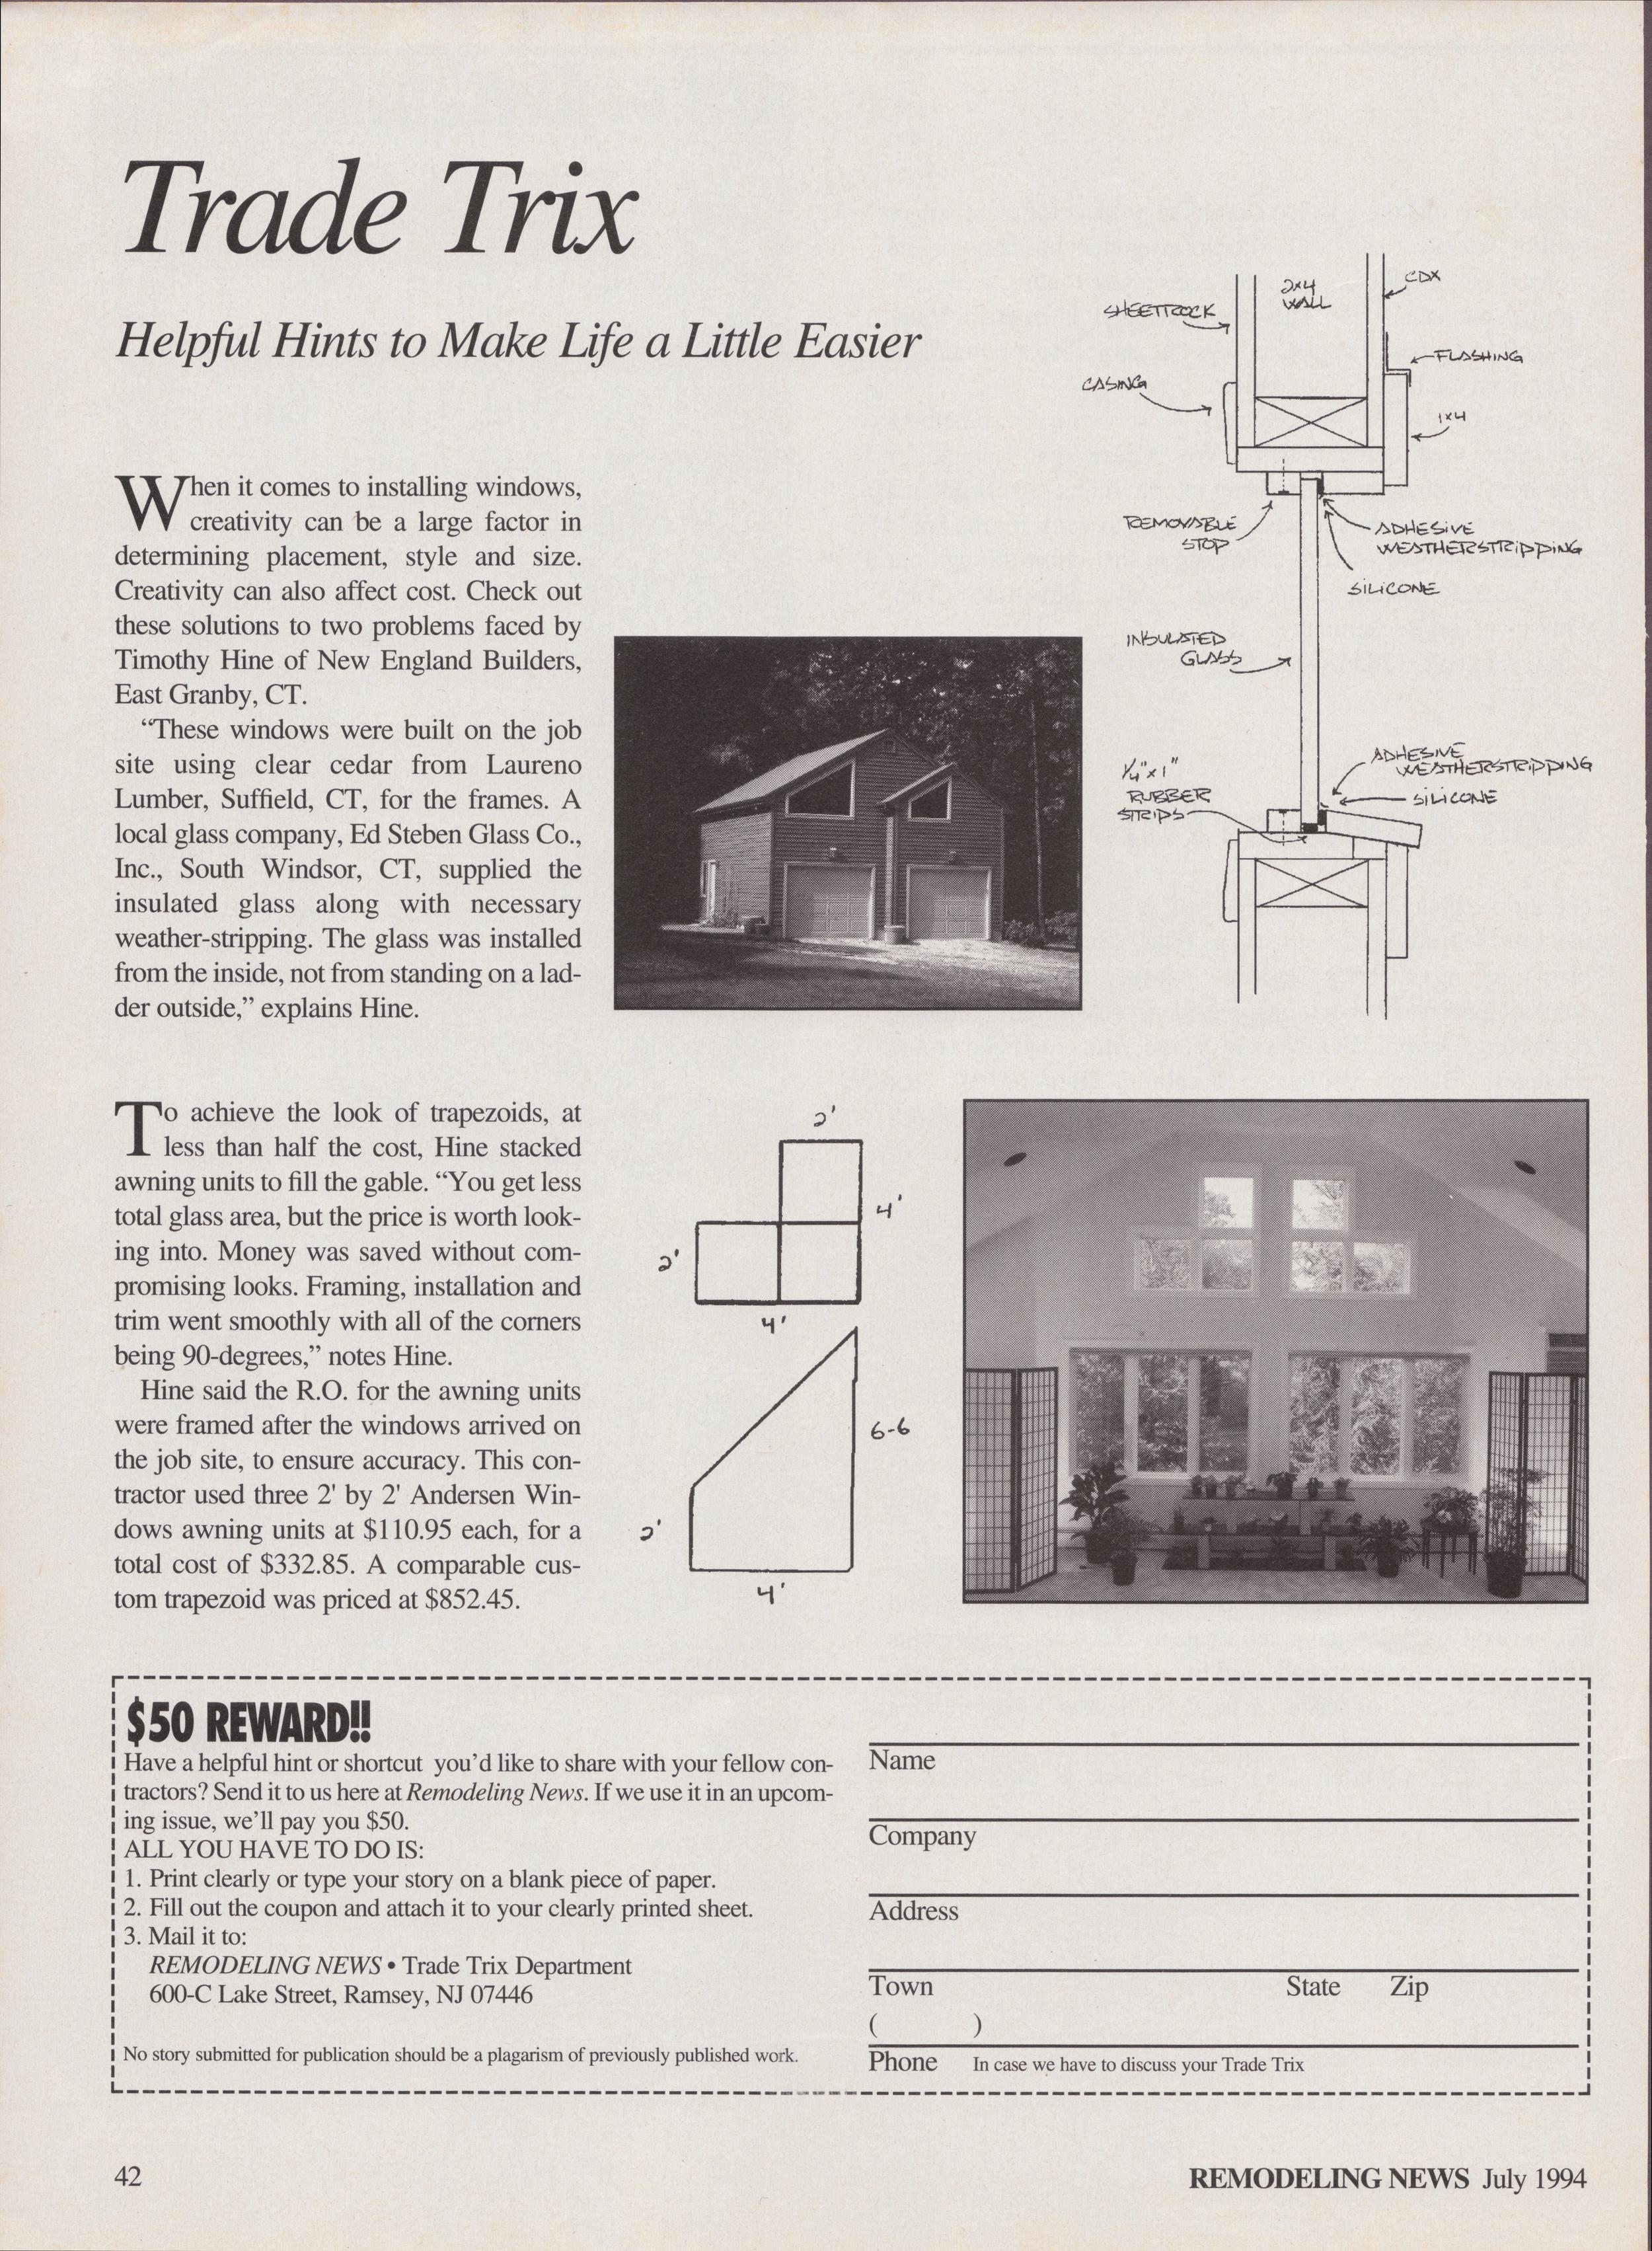 Remodeling_News1994b.jpg